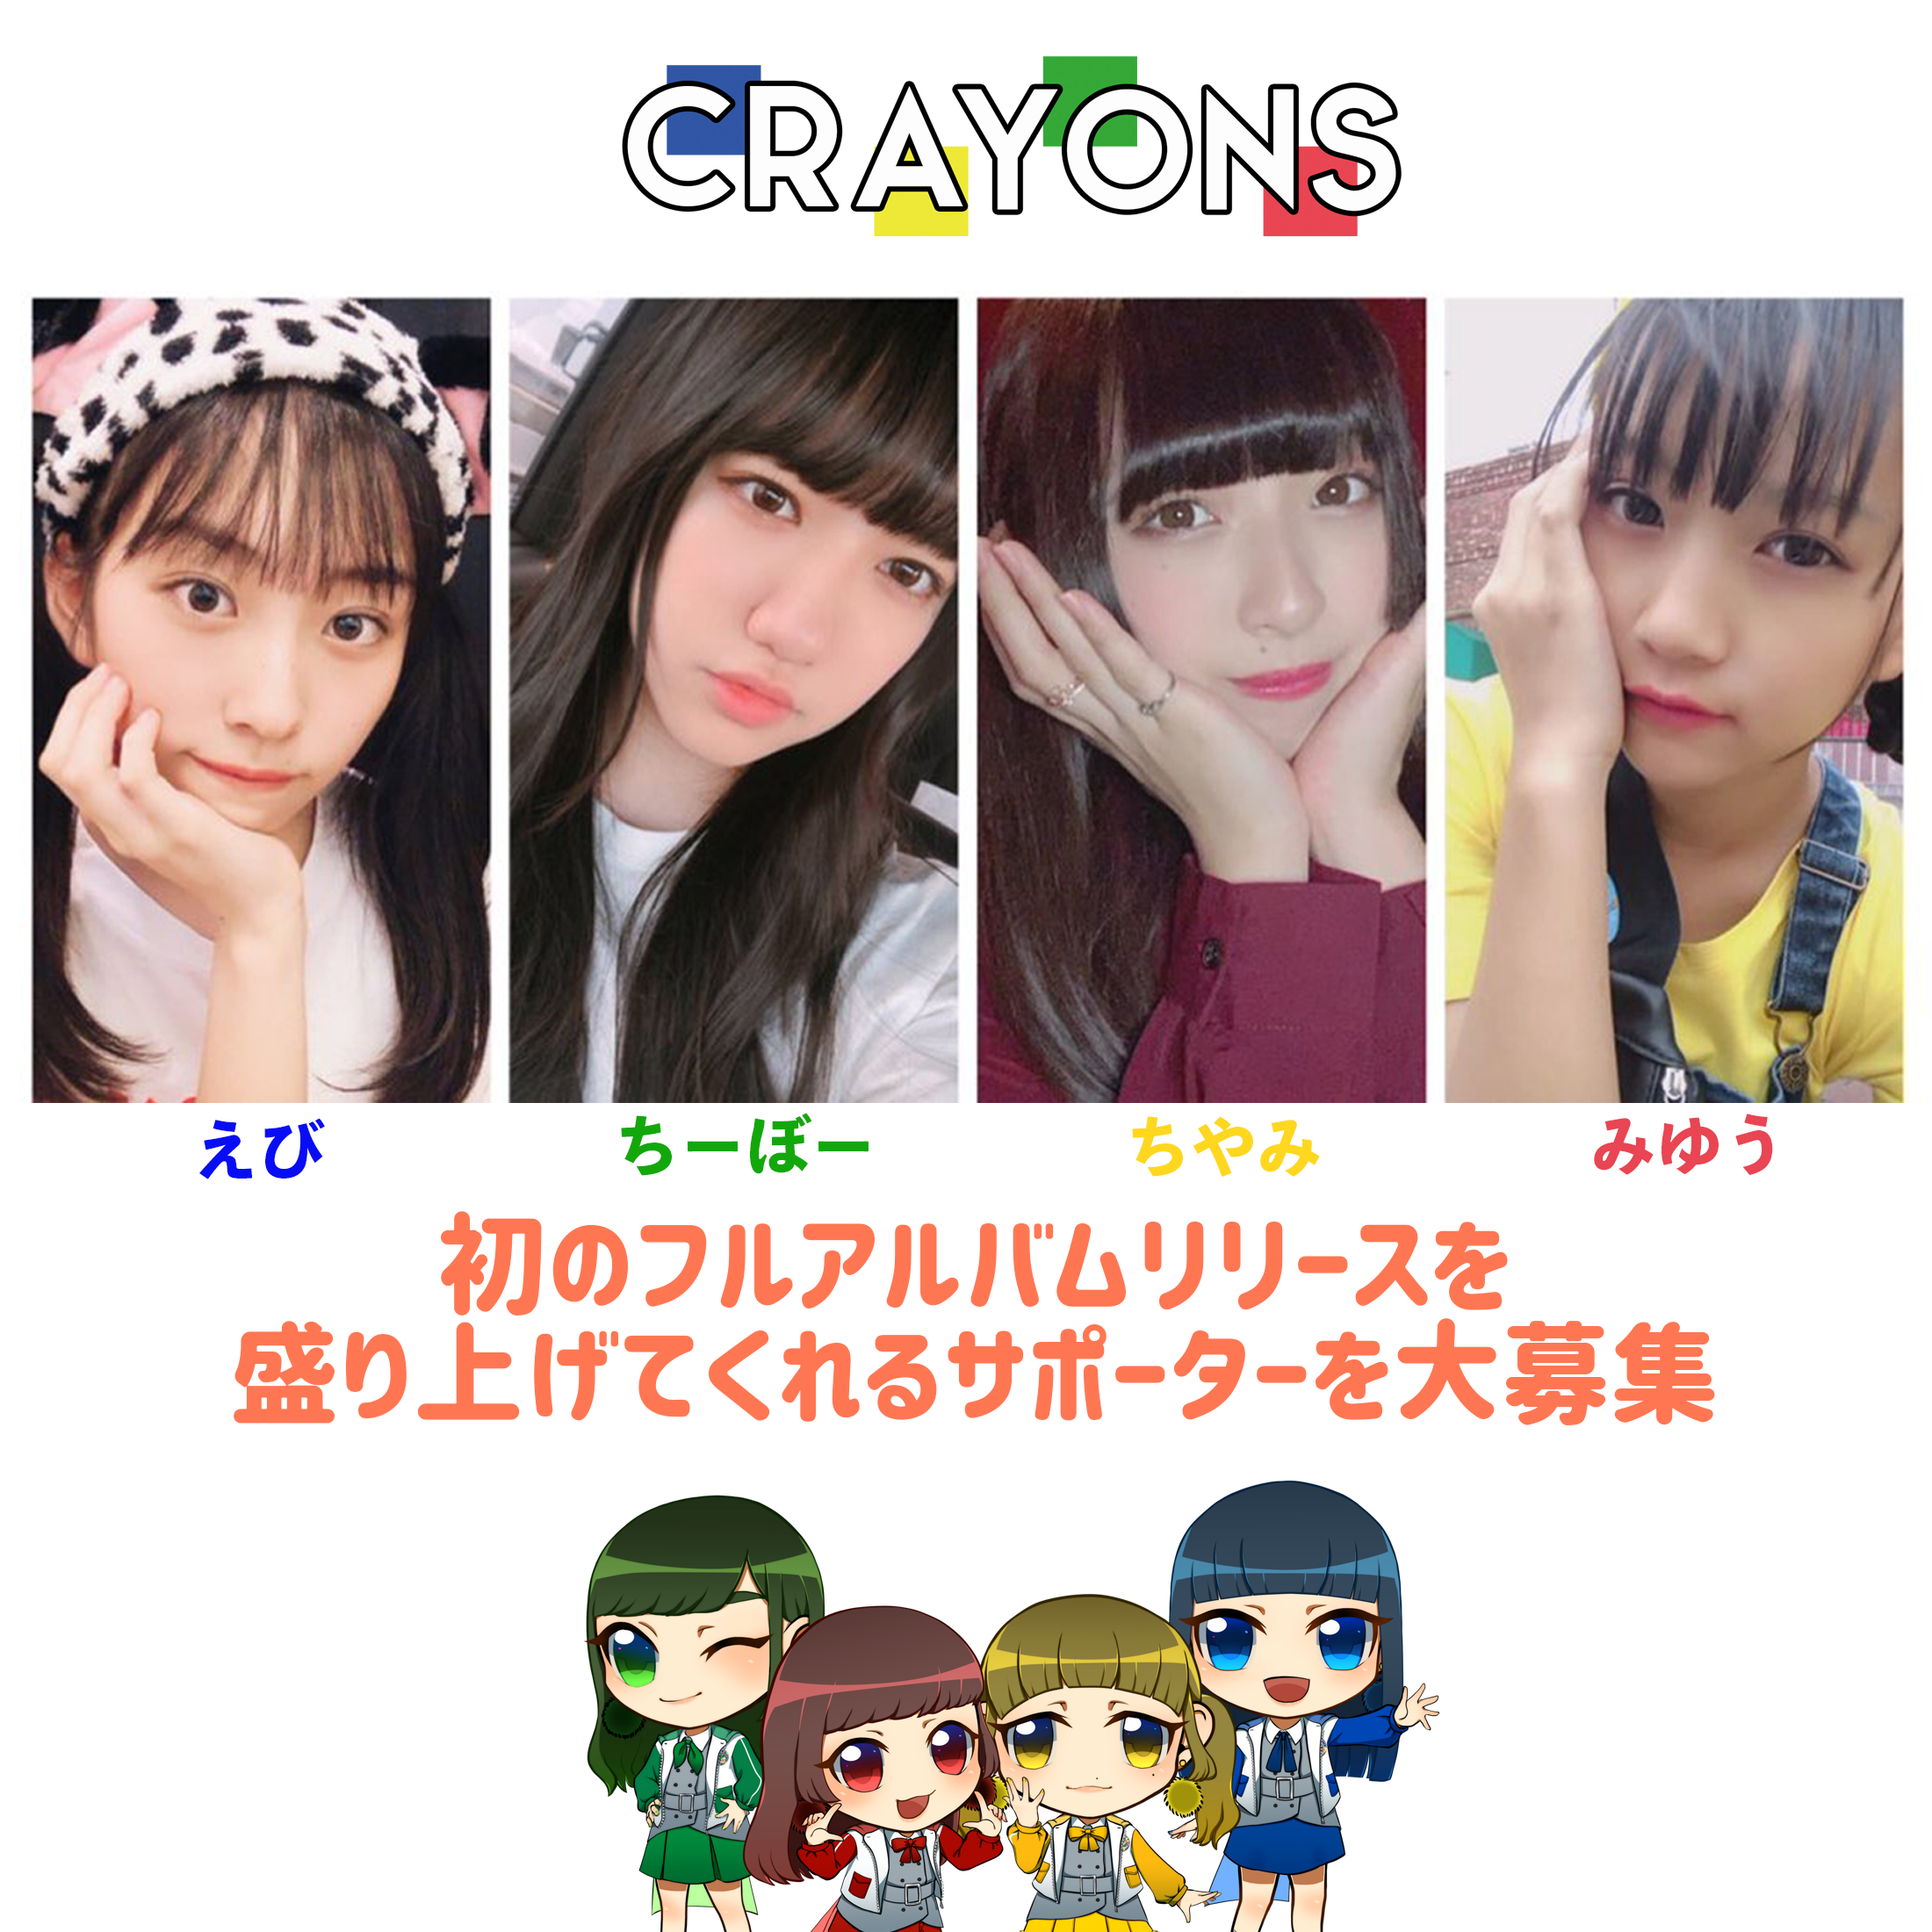 【CRAYONS】初のフルアルバムリリースを盛り上げてくれるサポーターを大募集